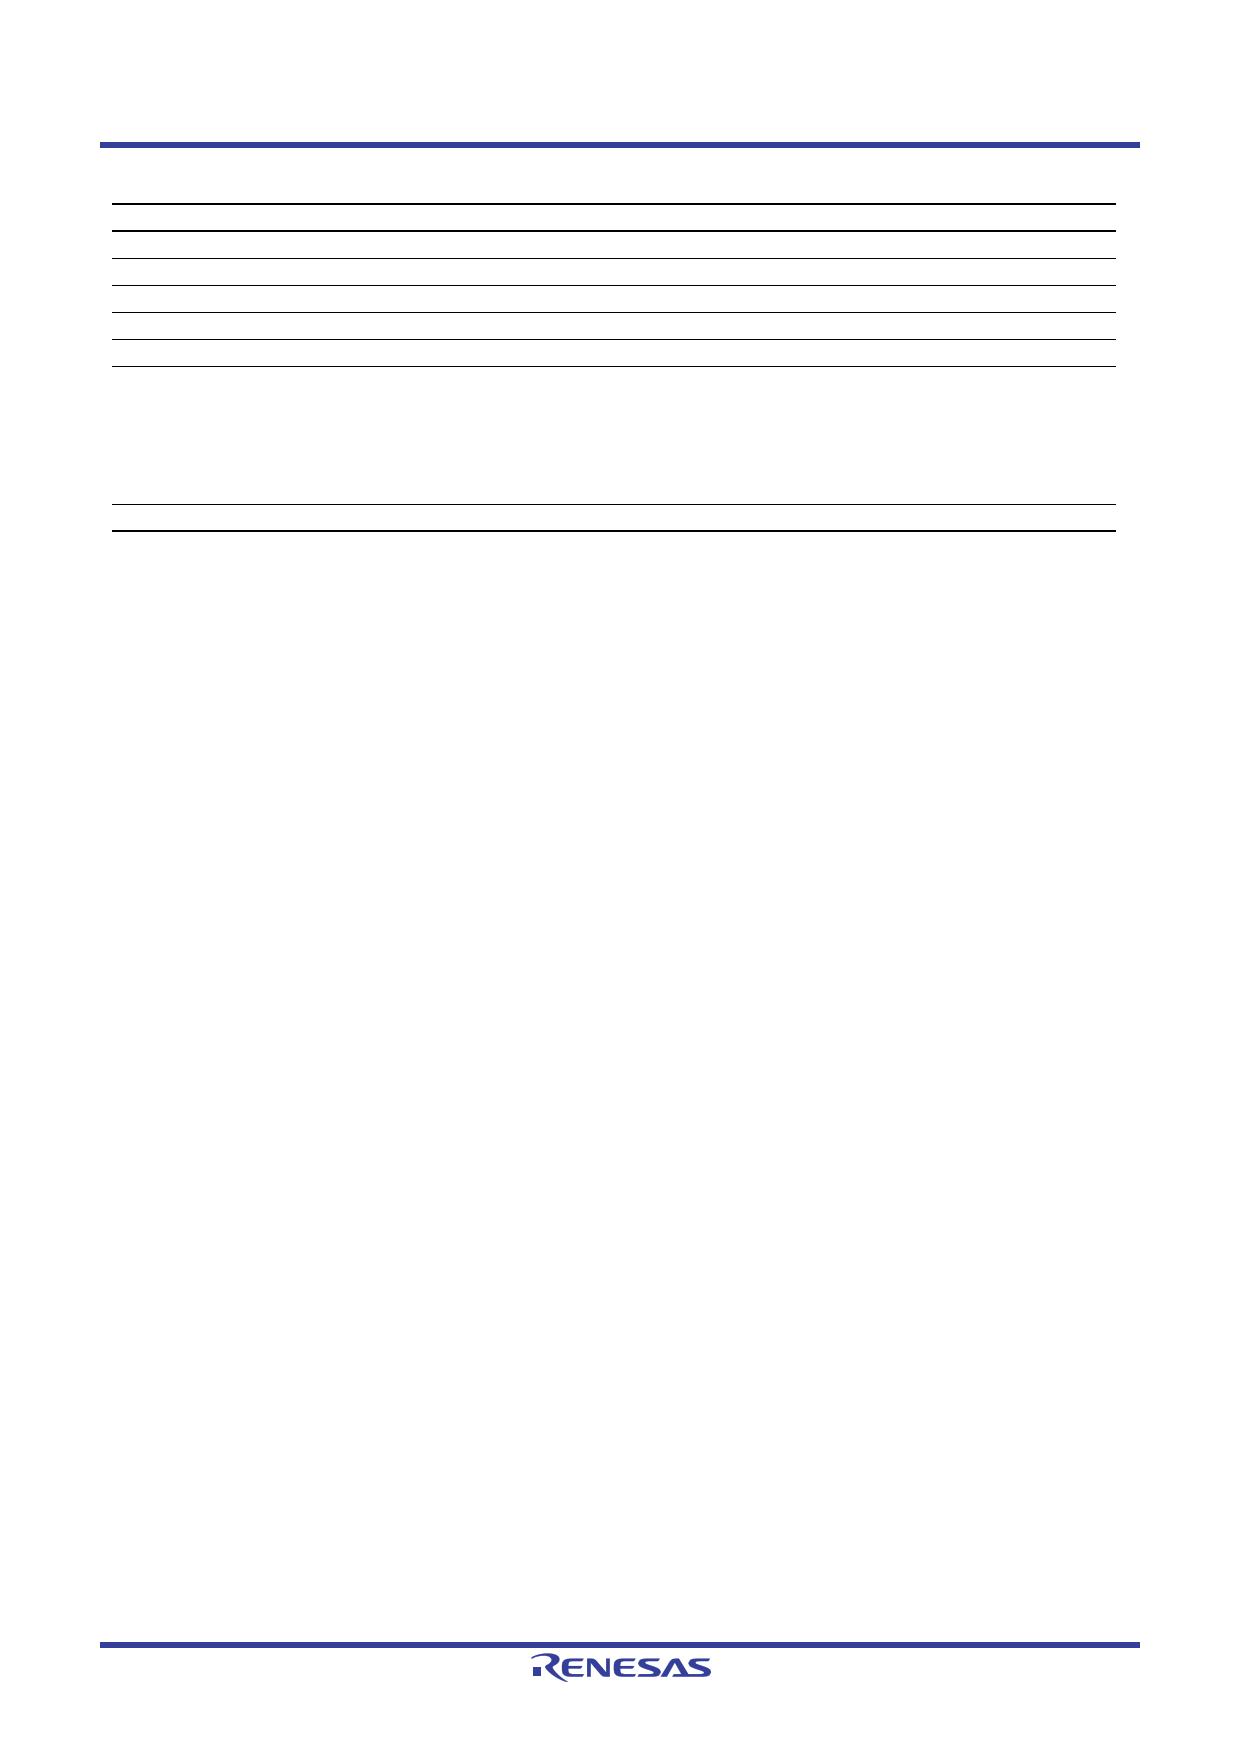 R5F51104ADLF pdf, 반도체, 판매, 대치품